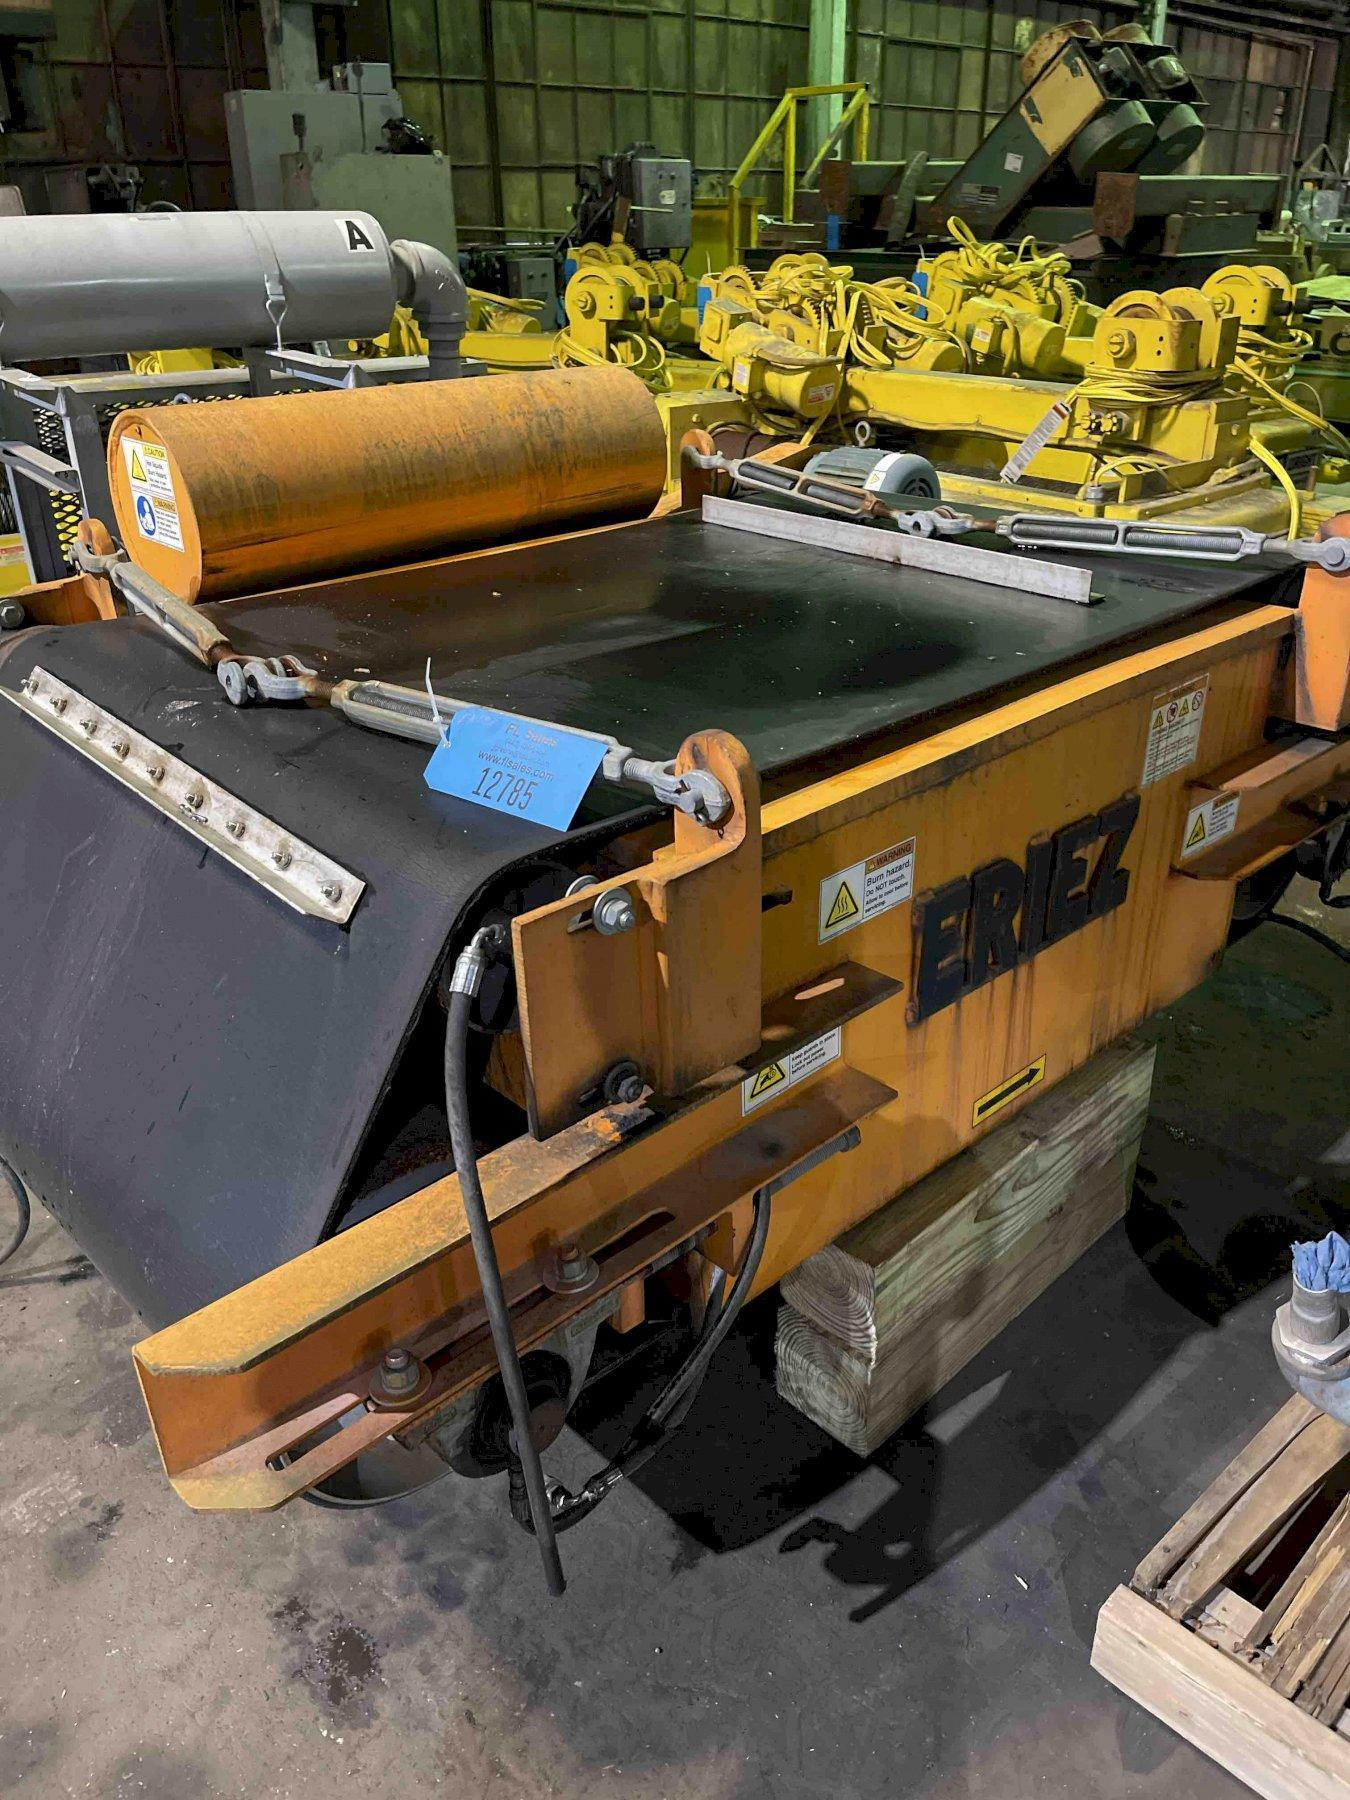 "eriez cross belt magnetic conveyor 42' x 42"" x 20.5 belt with controls"